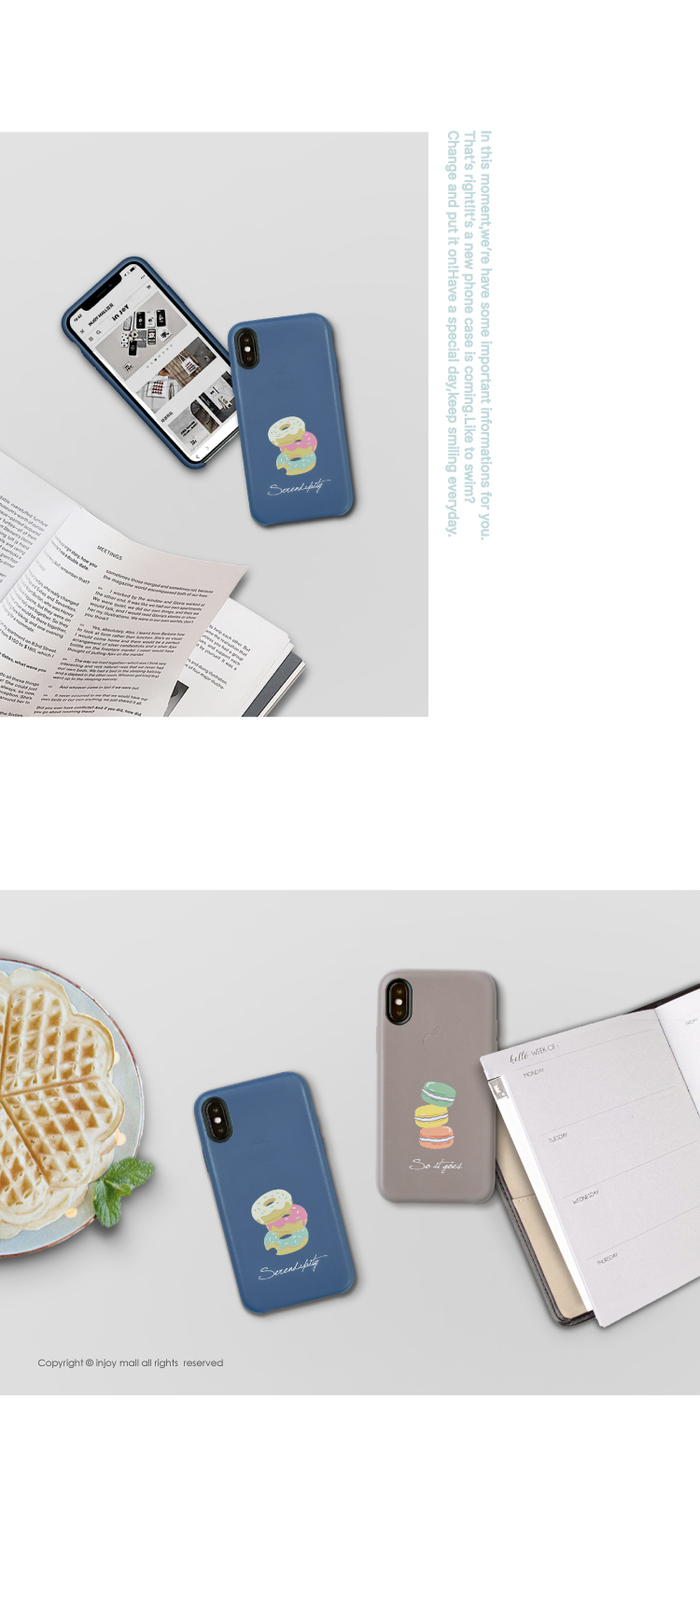 INJOY Mall|iPhone 7 / 8 / Plus / X 系列戀愛滋味甜甜圈 皮革手機殼 保護套